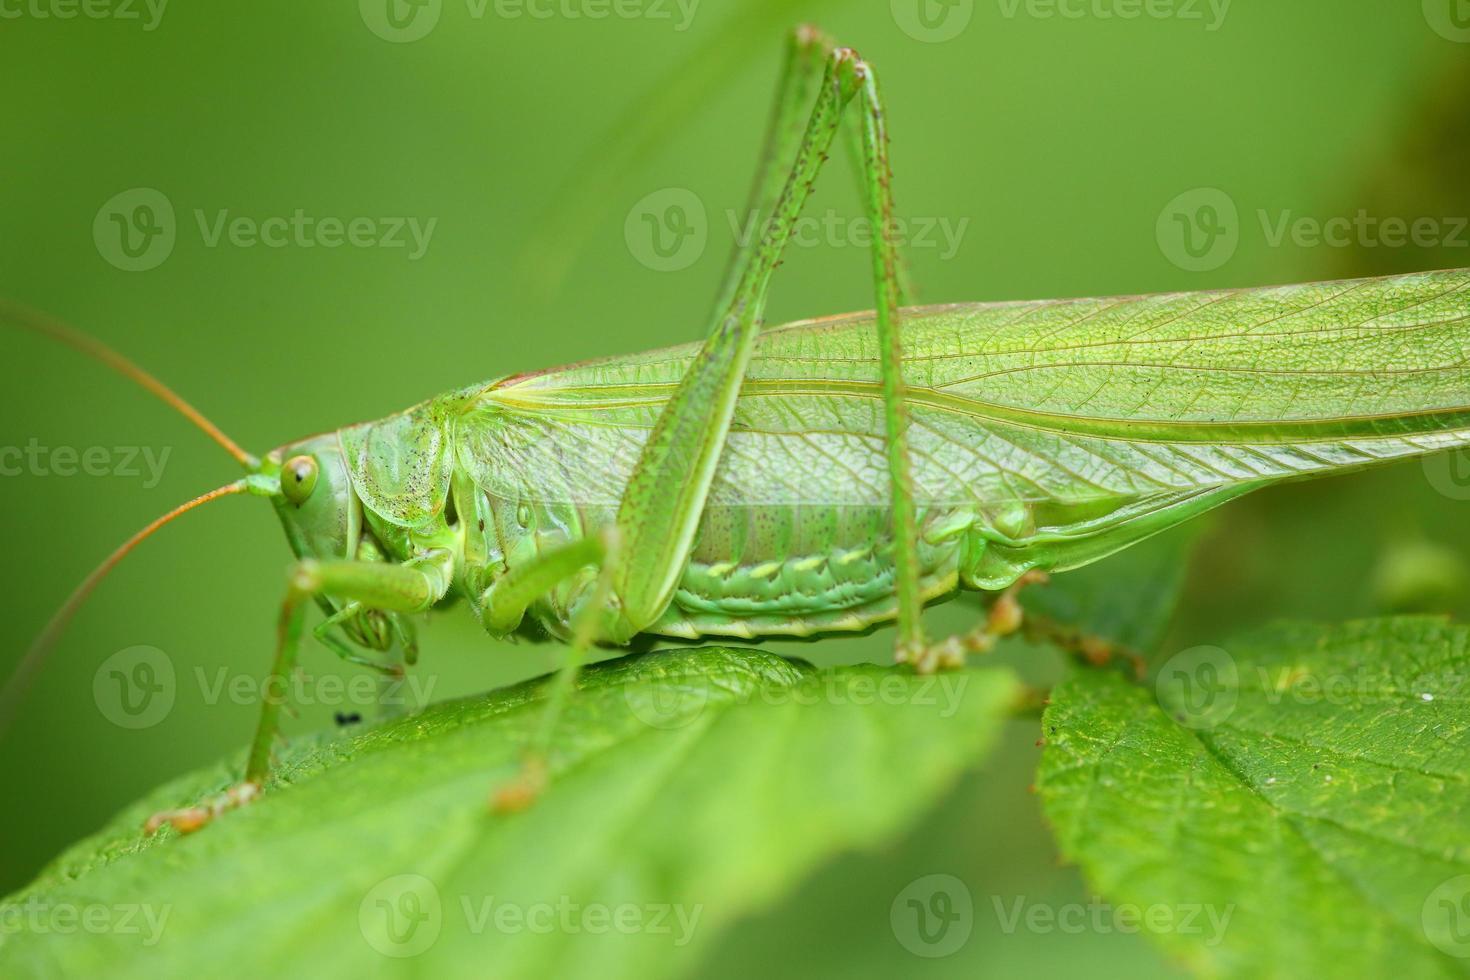 saltamontes verde foto